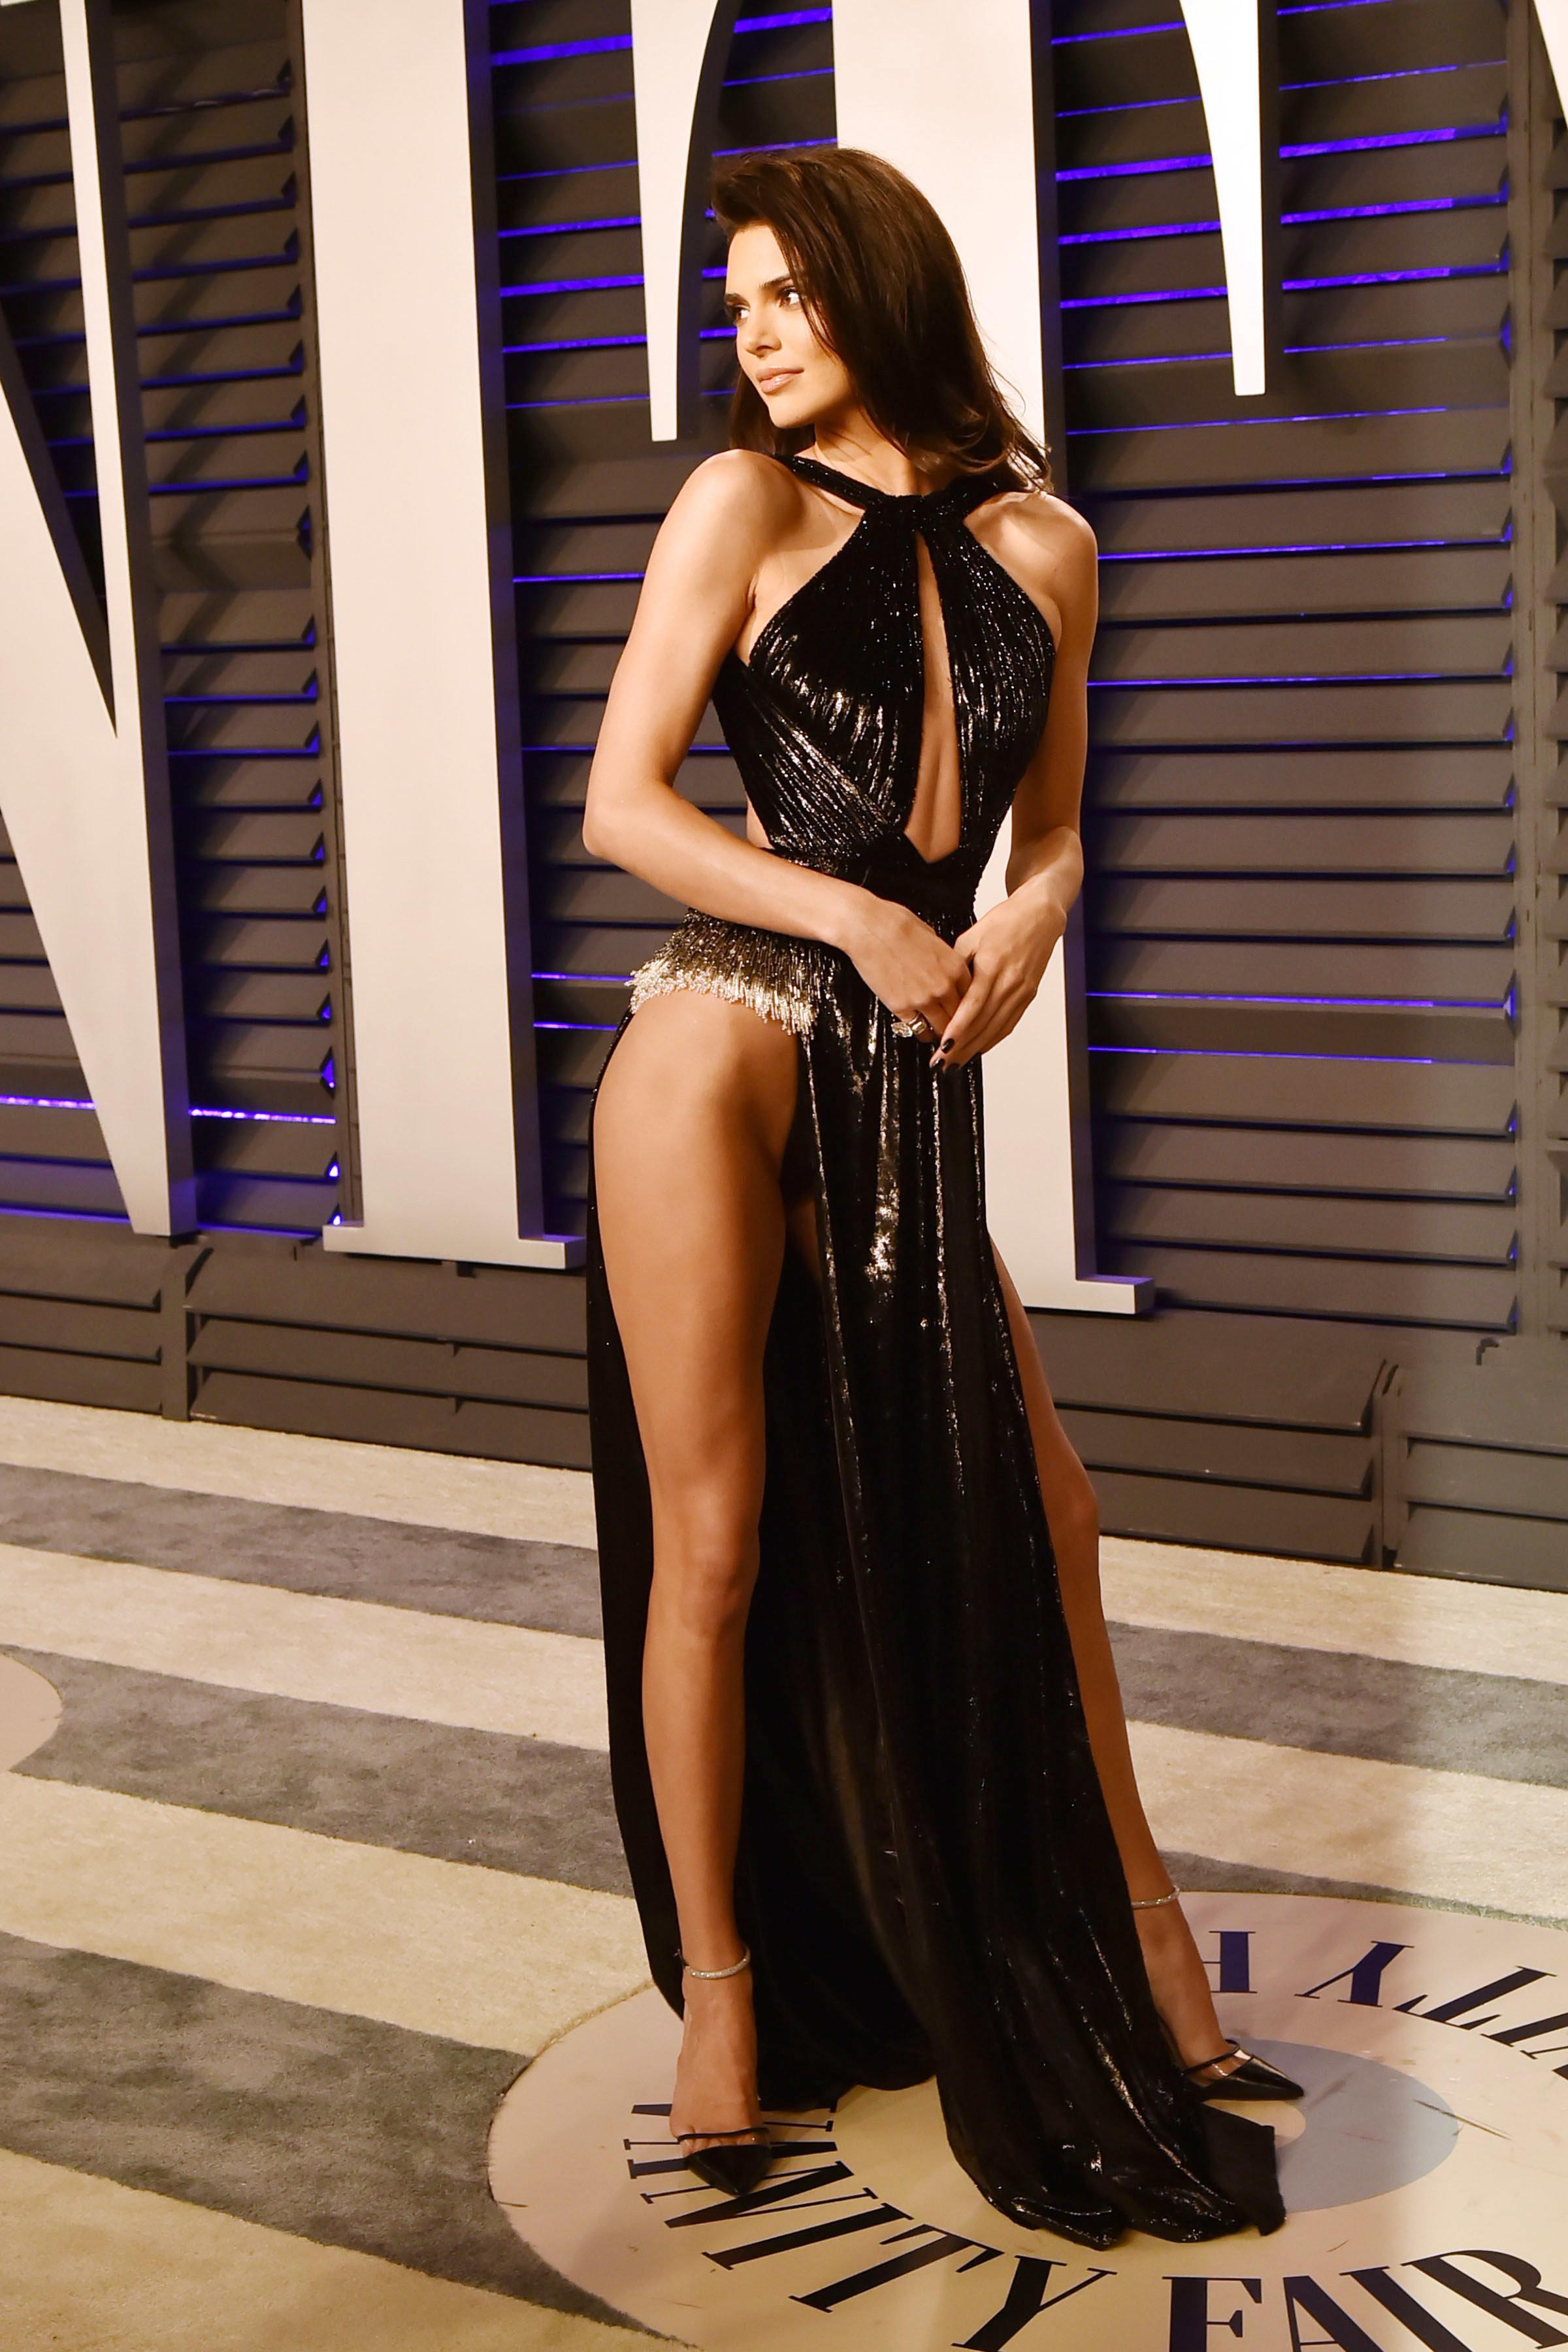 Jenner wore a black velvet halter dress by Rami Kadi Maison de Couture.